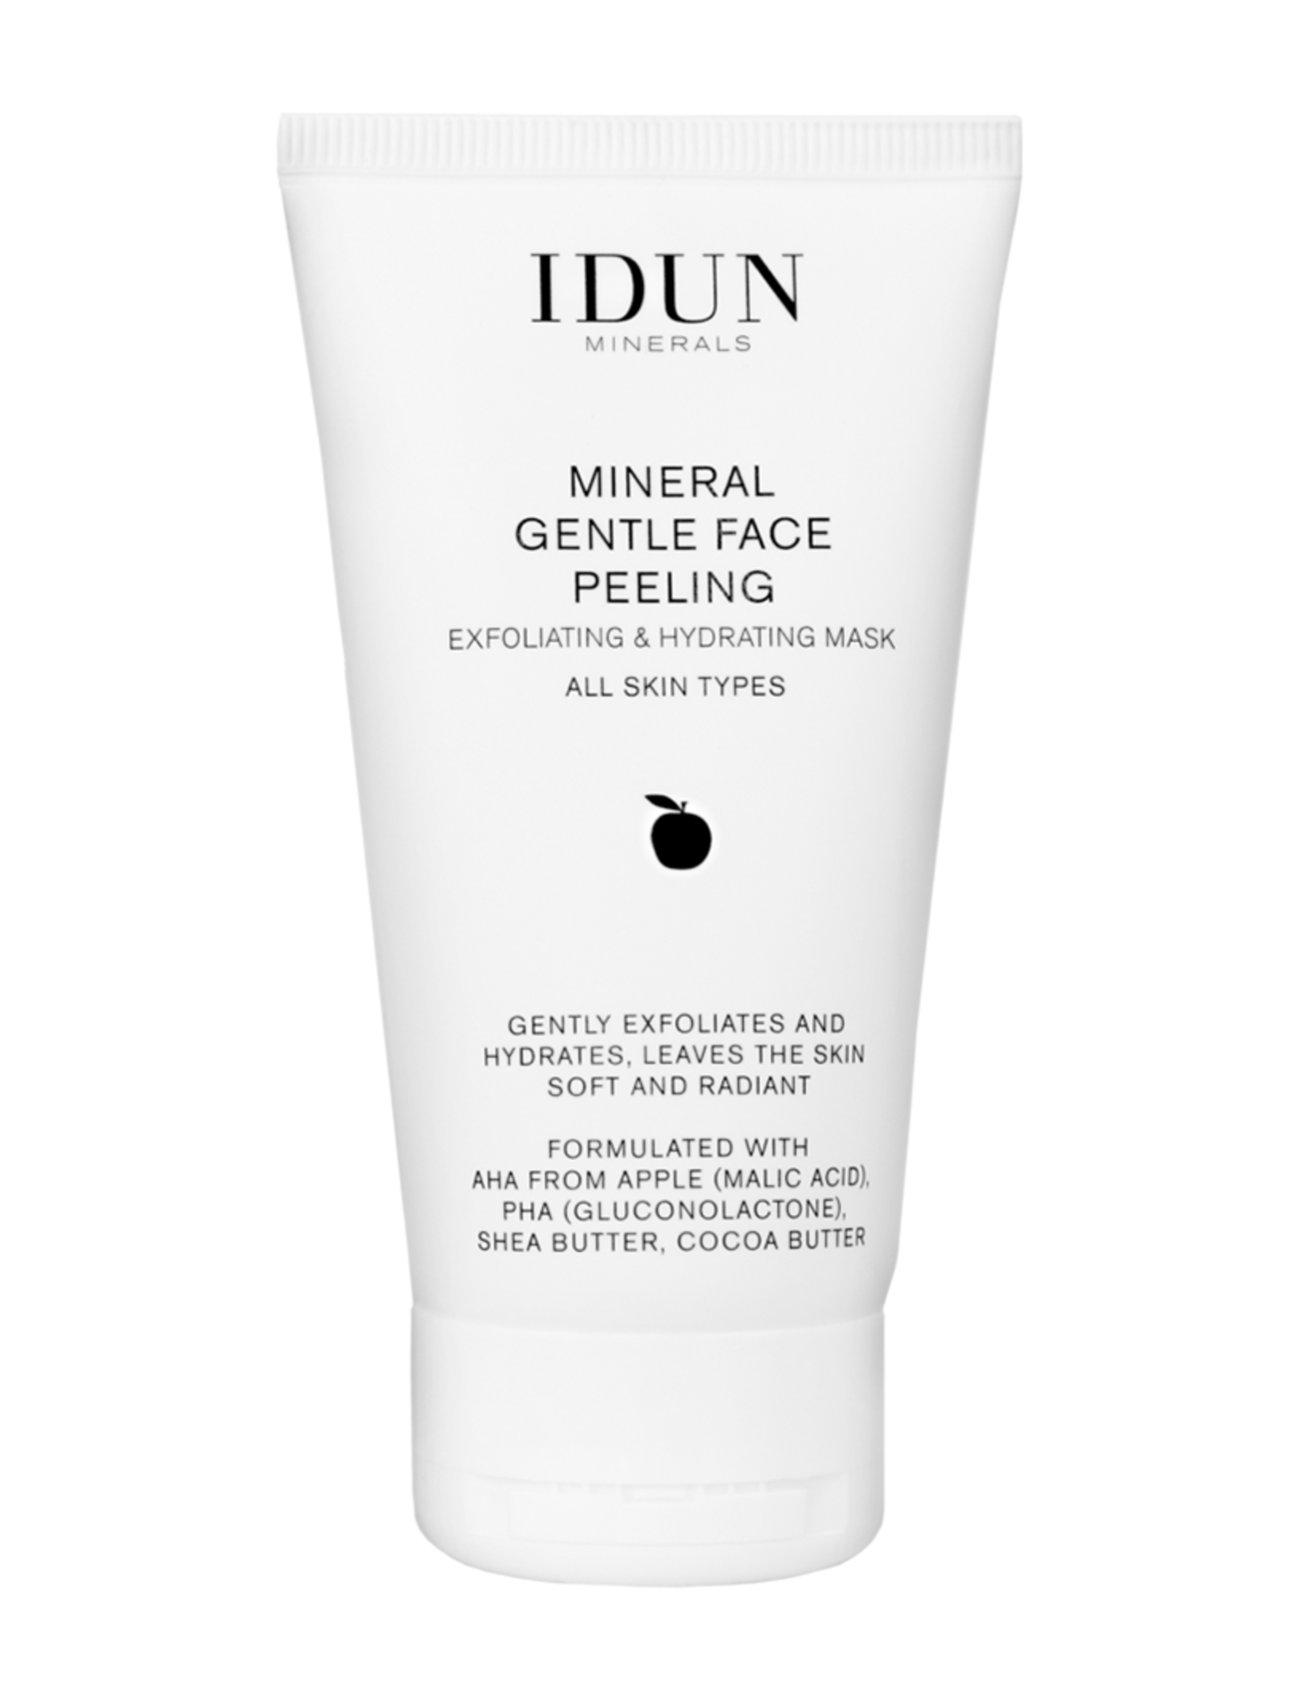 Image of Gentle Exfoliating Cream Beauty WOMEN Skin Care Face Peelings Nude IDUN Minerals (3252227053)